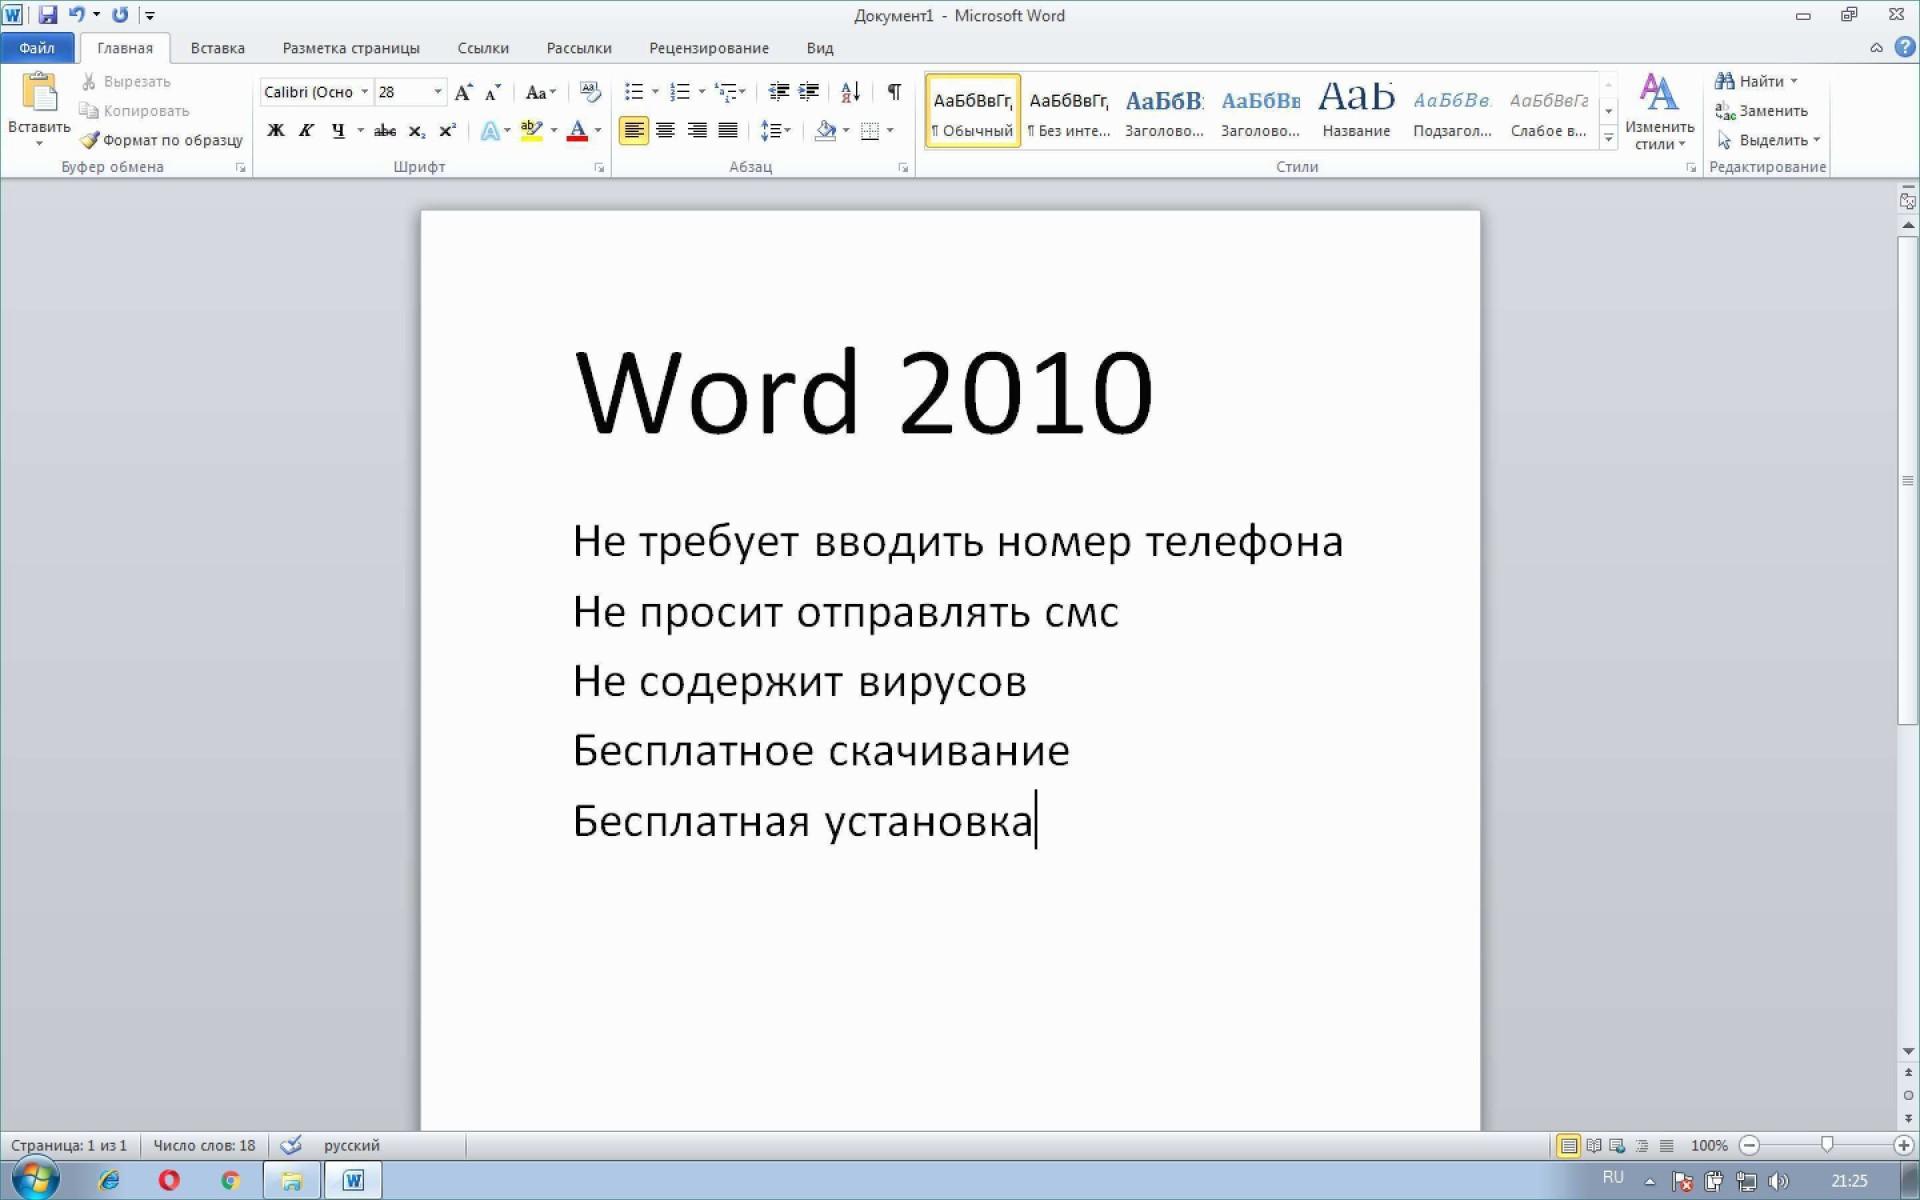 006 Beautiful Busines Card Template Microsoft Word 2010 High Def 1920